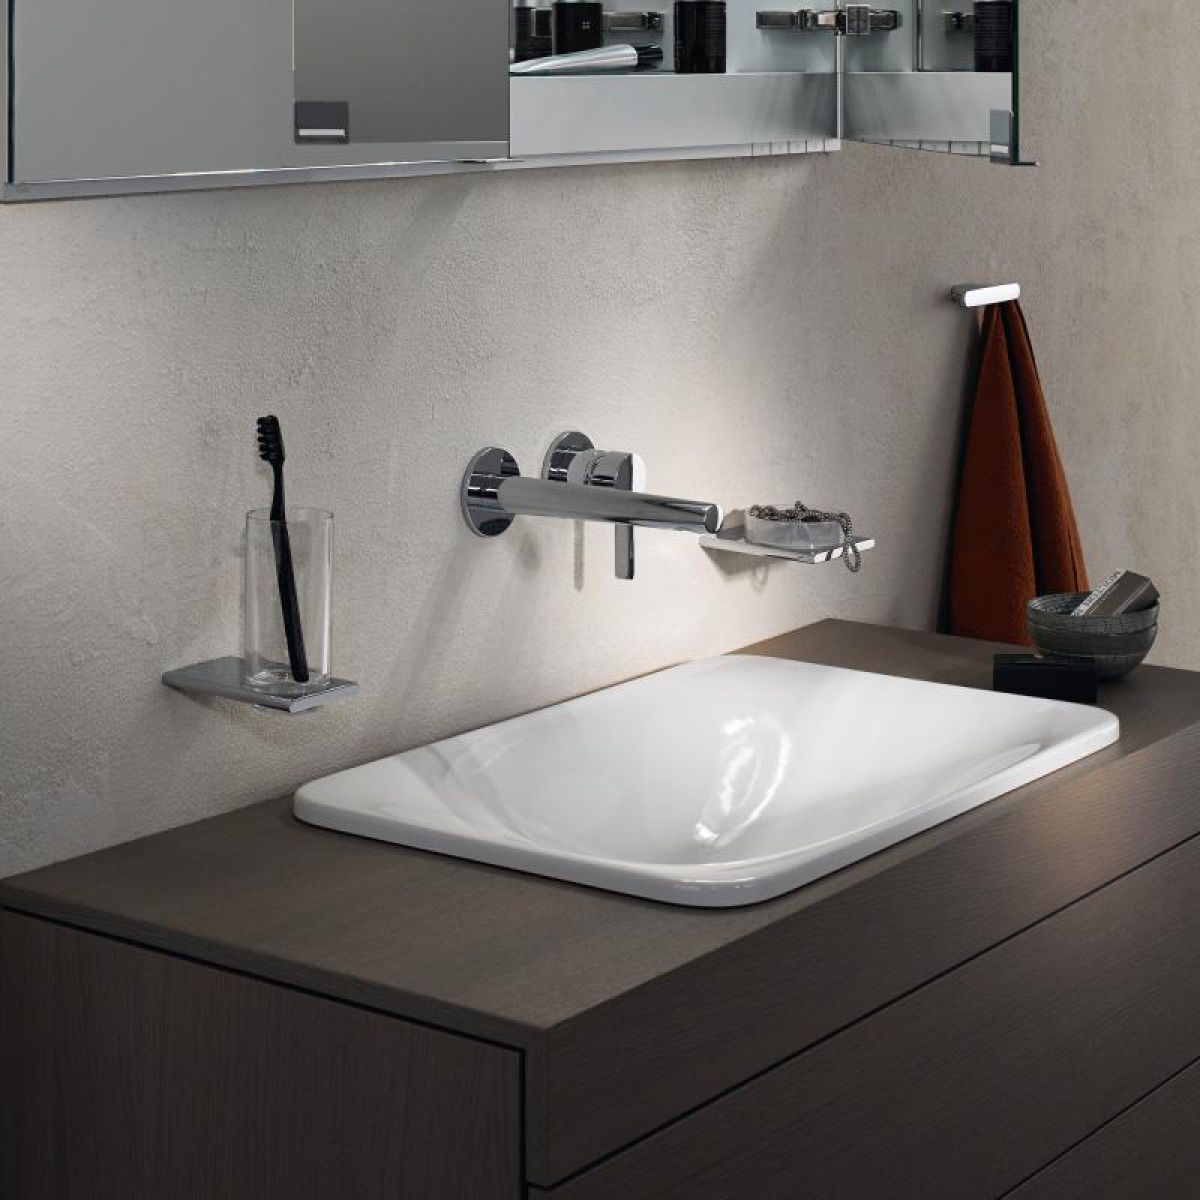 keuco edition 400 concealed single lever basin mixer uk bathrooms. Black Bedroom Furniture Sets. Home Design Ideas